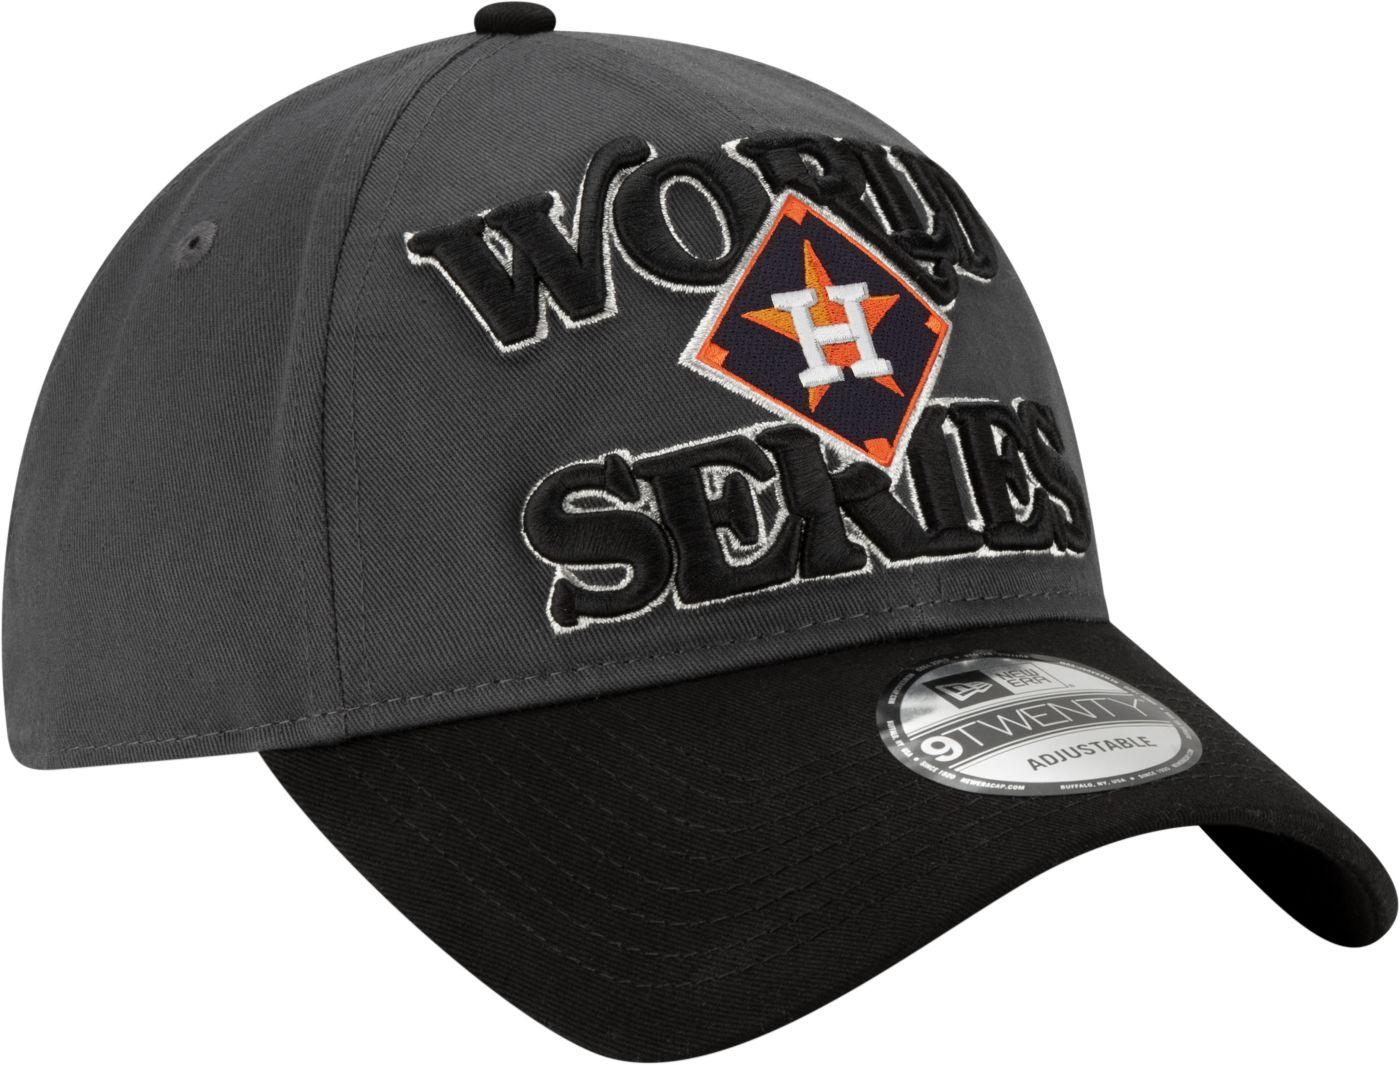 New Era Men's 2019 American League Champions Locker Room 9Twenty Houston Astros Adjustable Hat